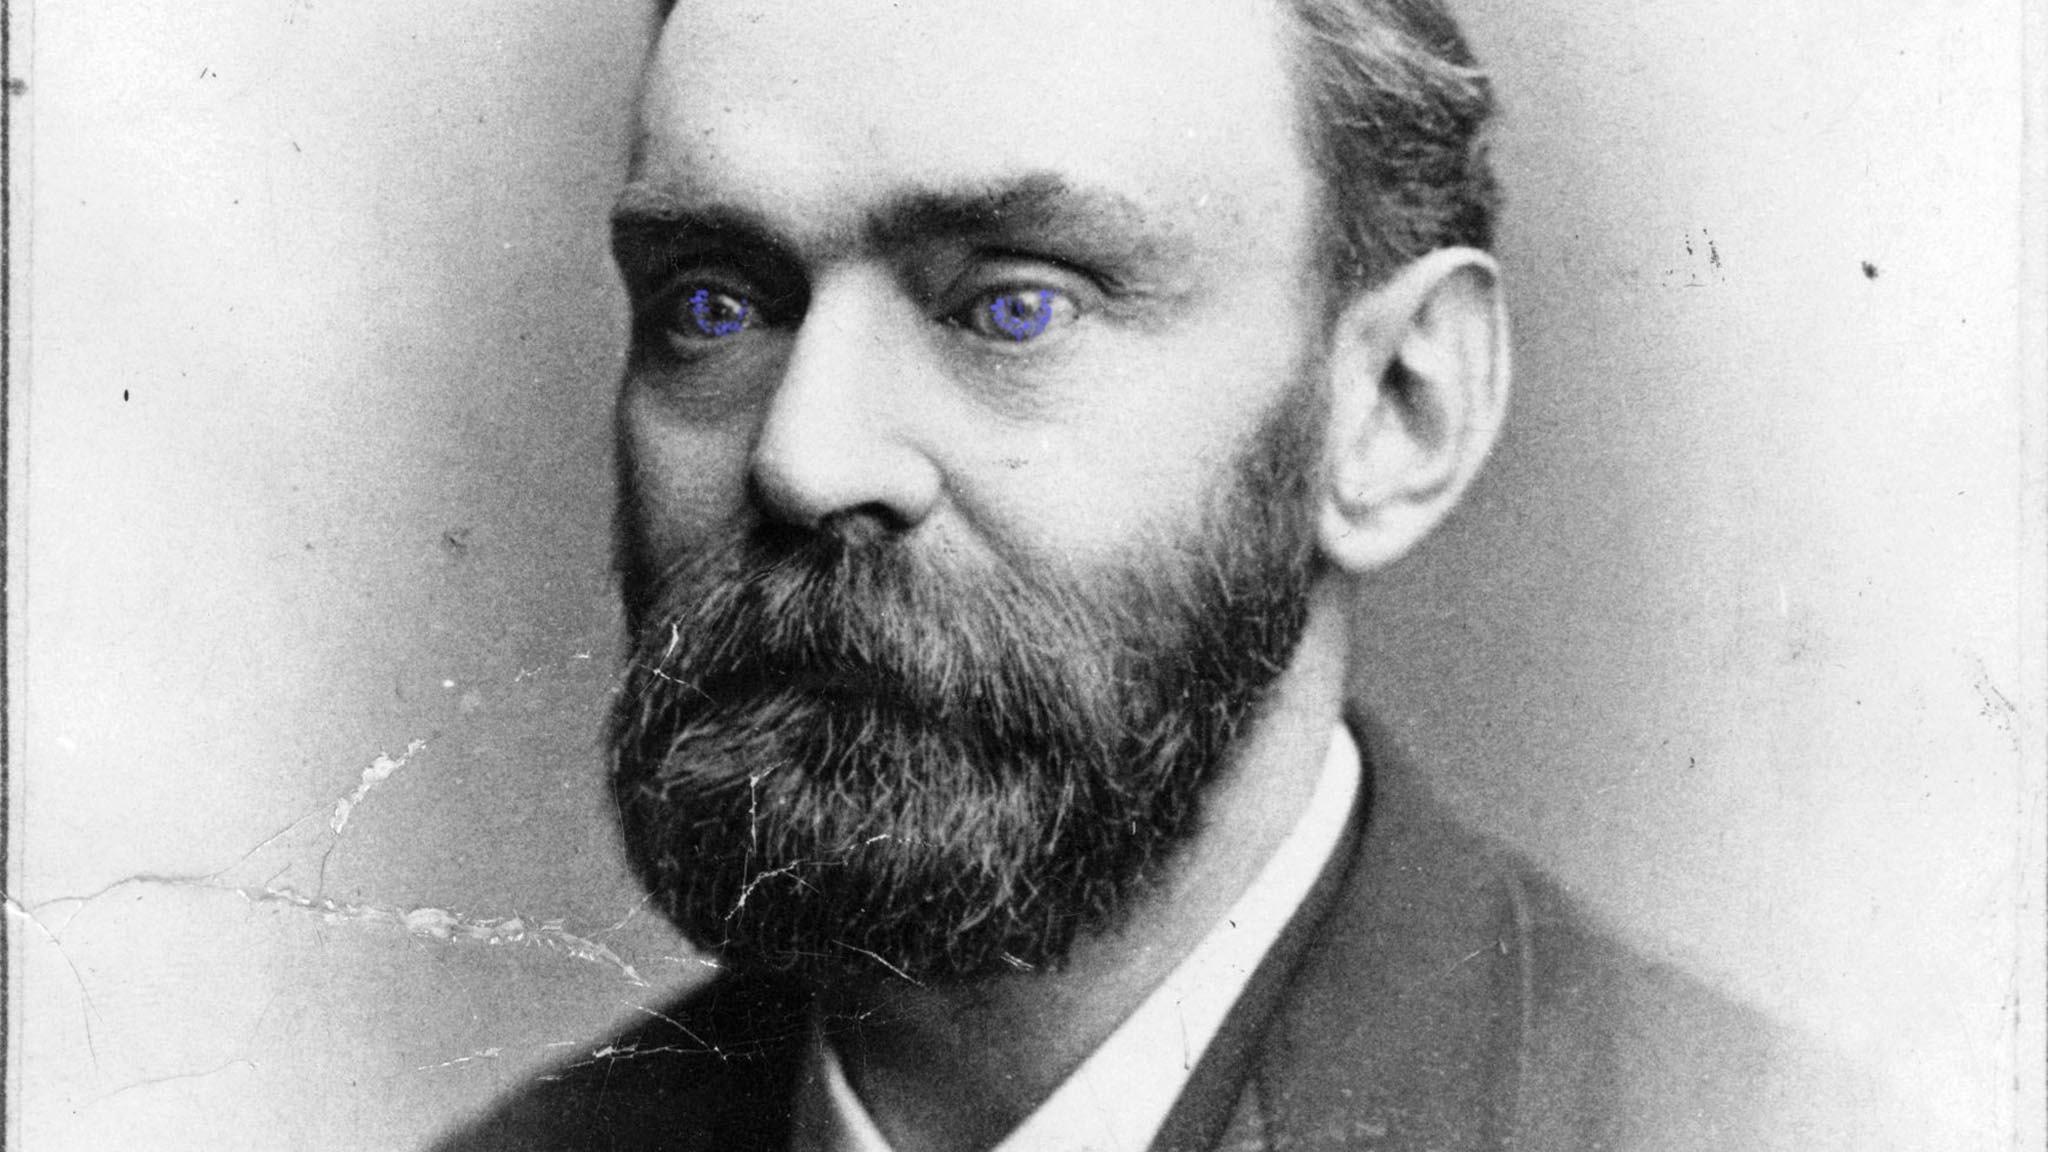 Nobelpristagarens ron hemligt i fyrtio ar